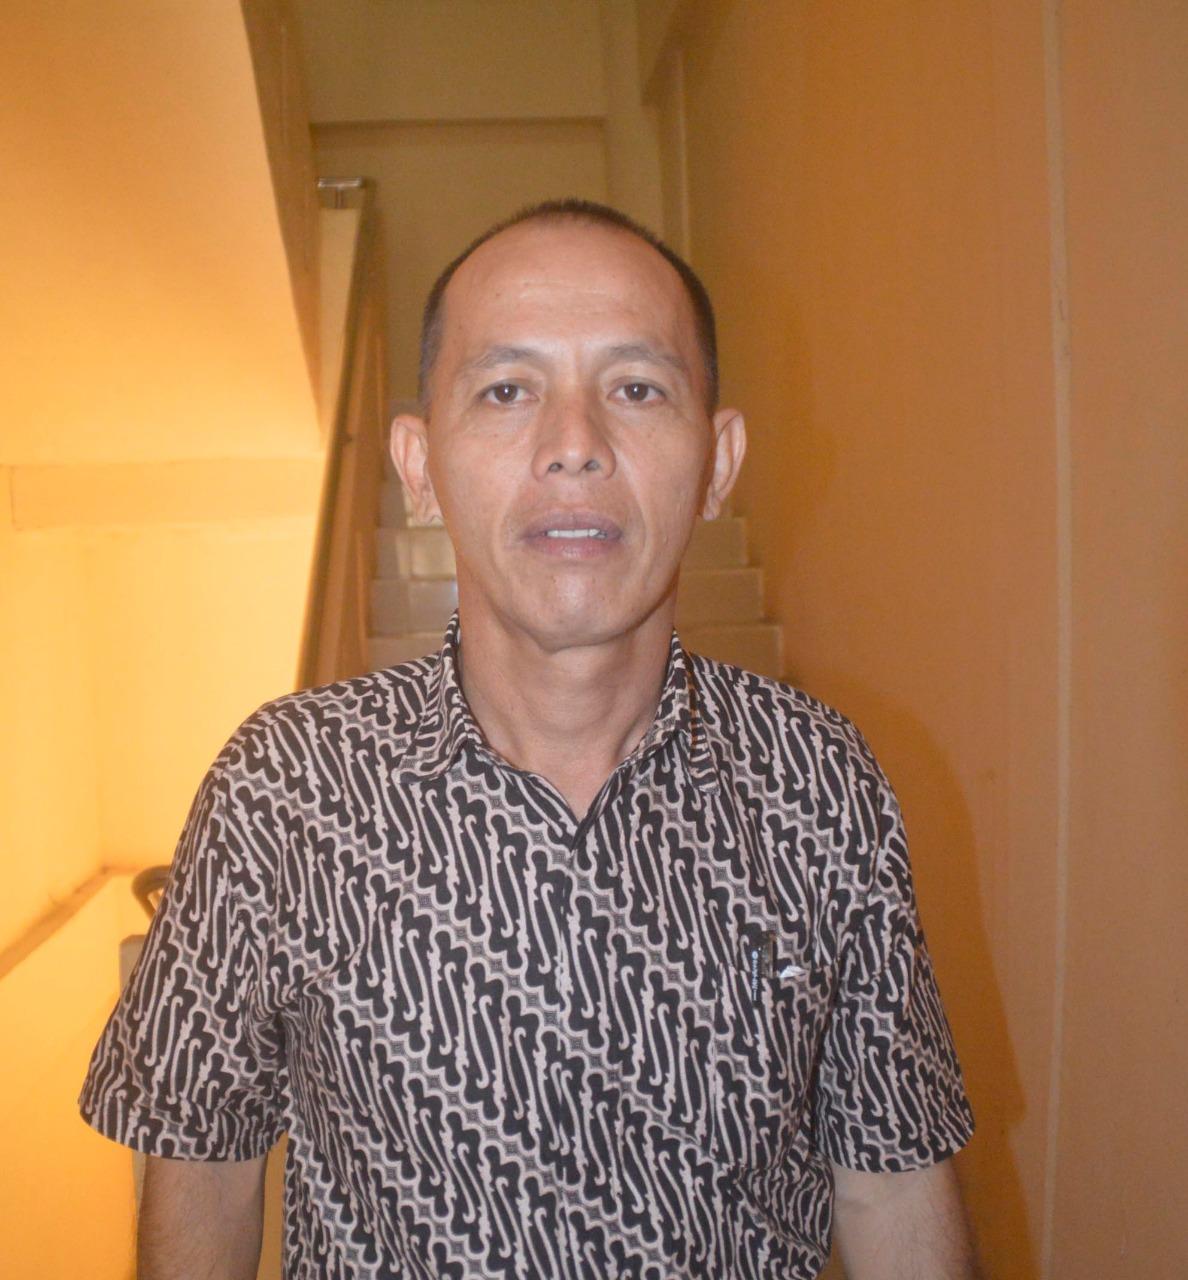 Foto---Konggo Tjintalong Tjondro, Ketua Panitia Cap Go Me 2020 Kabupaten Sanggau